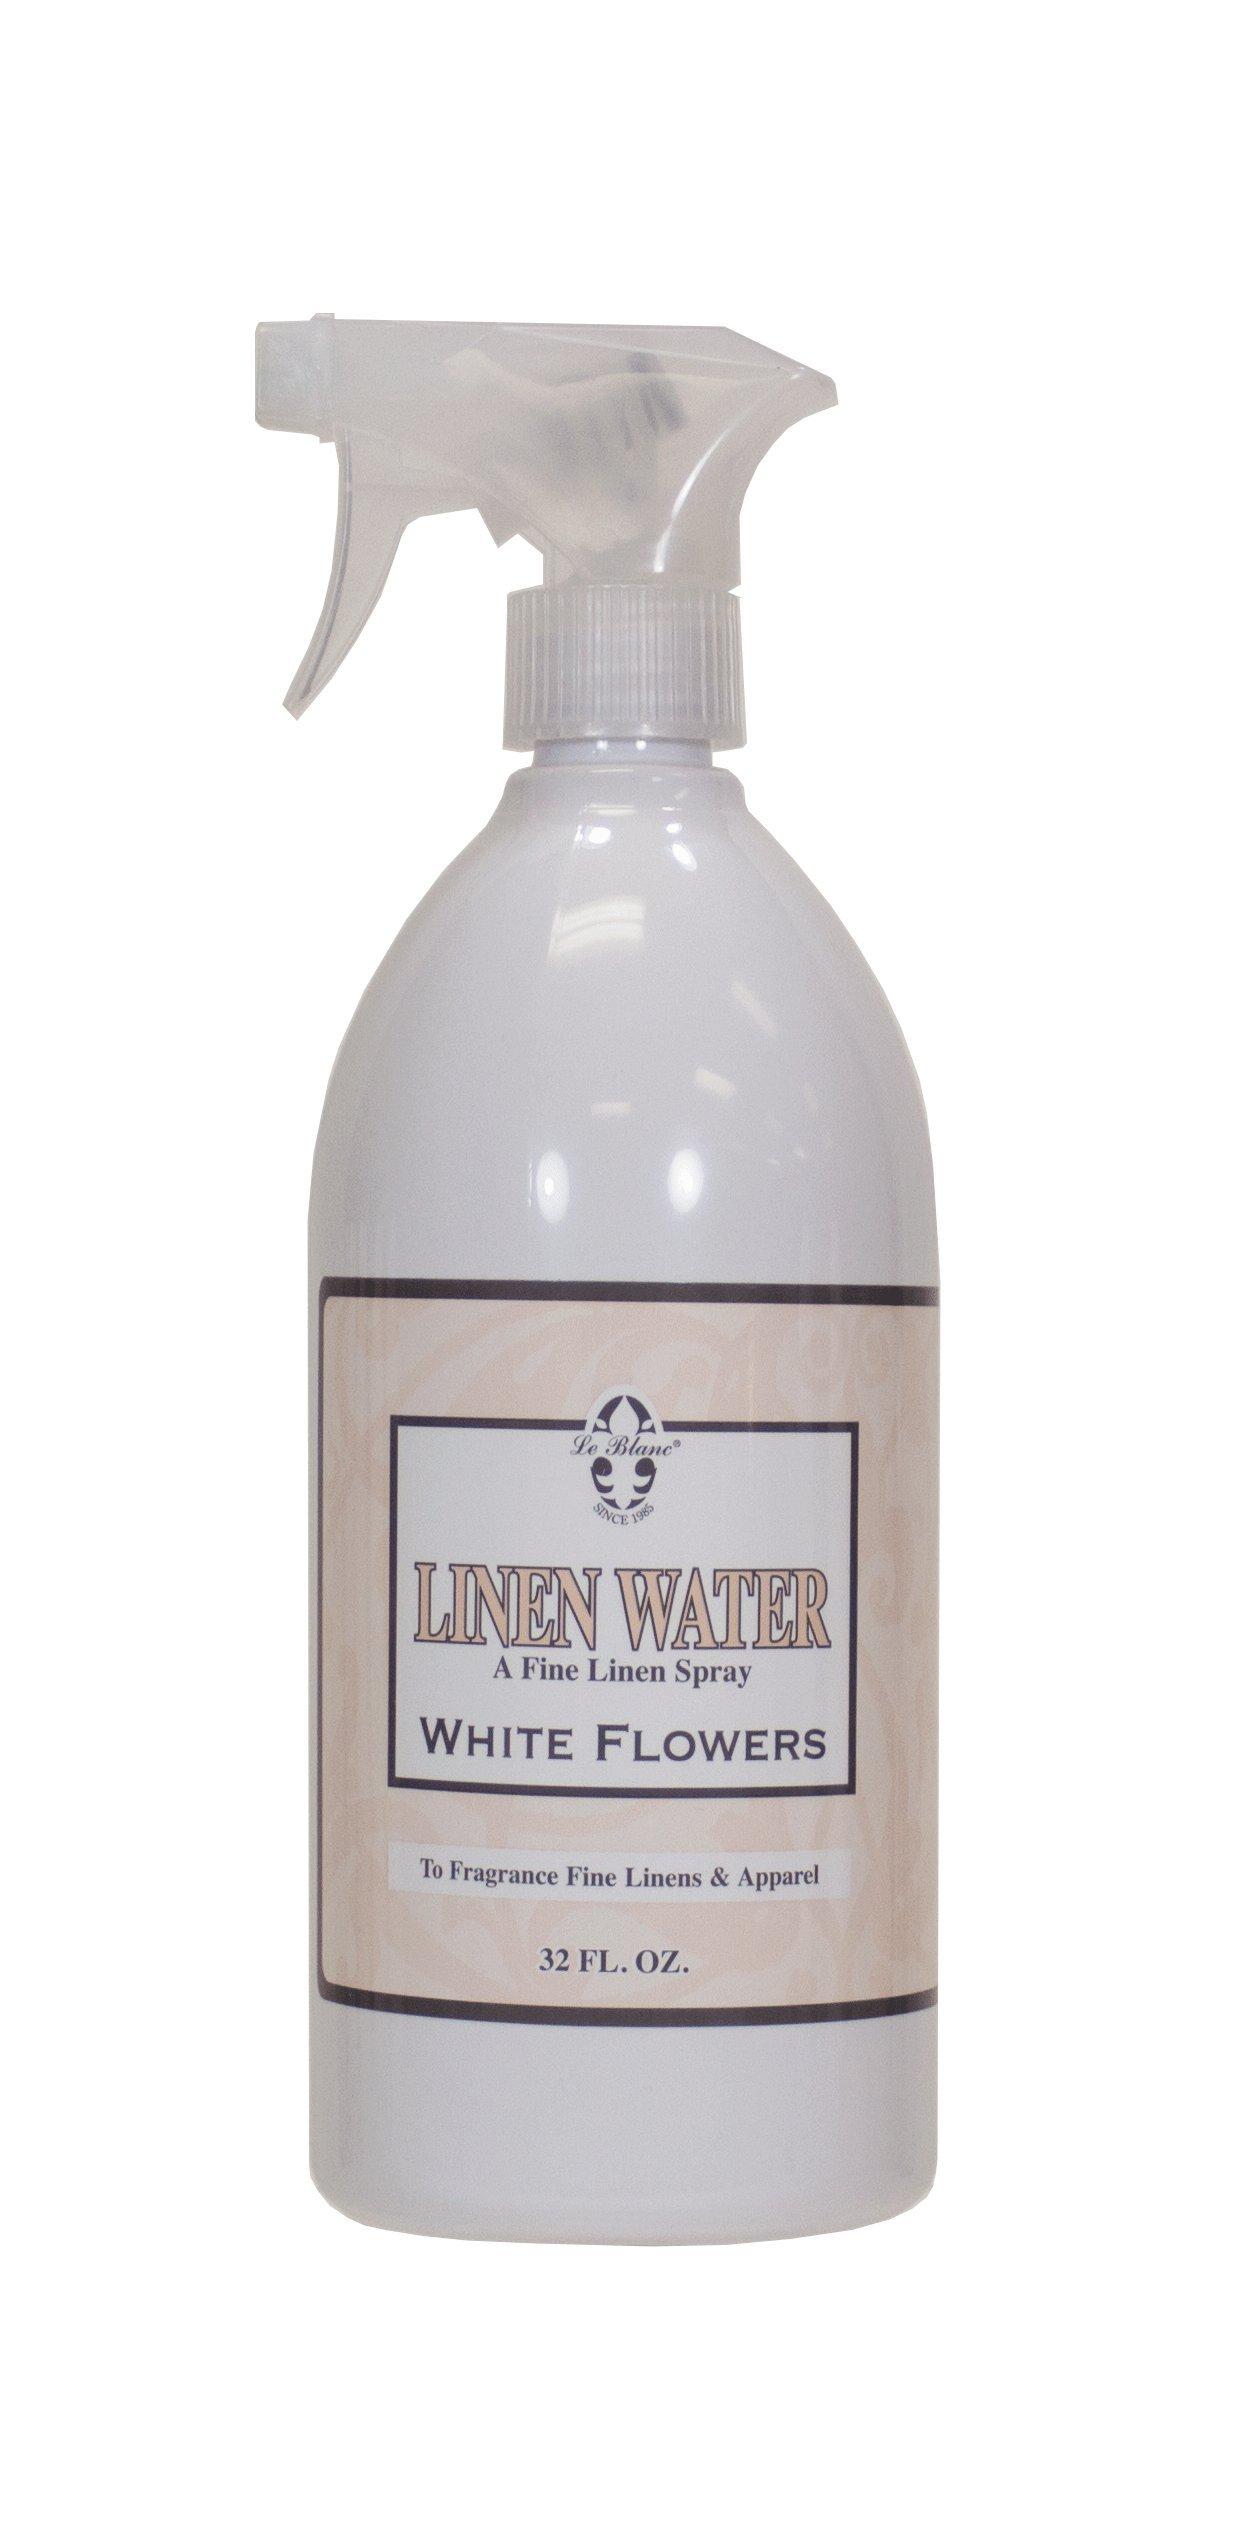 Le Blanc® White Flowers Linen Water - 32 FL. OZ, 9 Pack